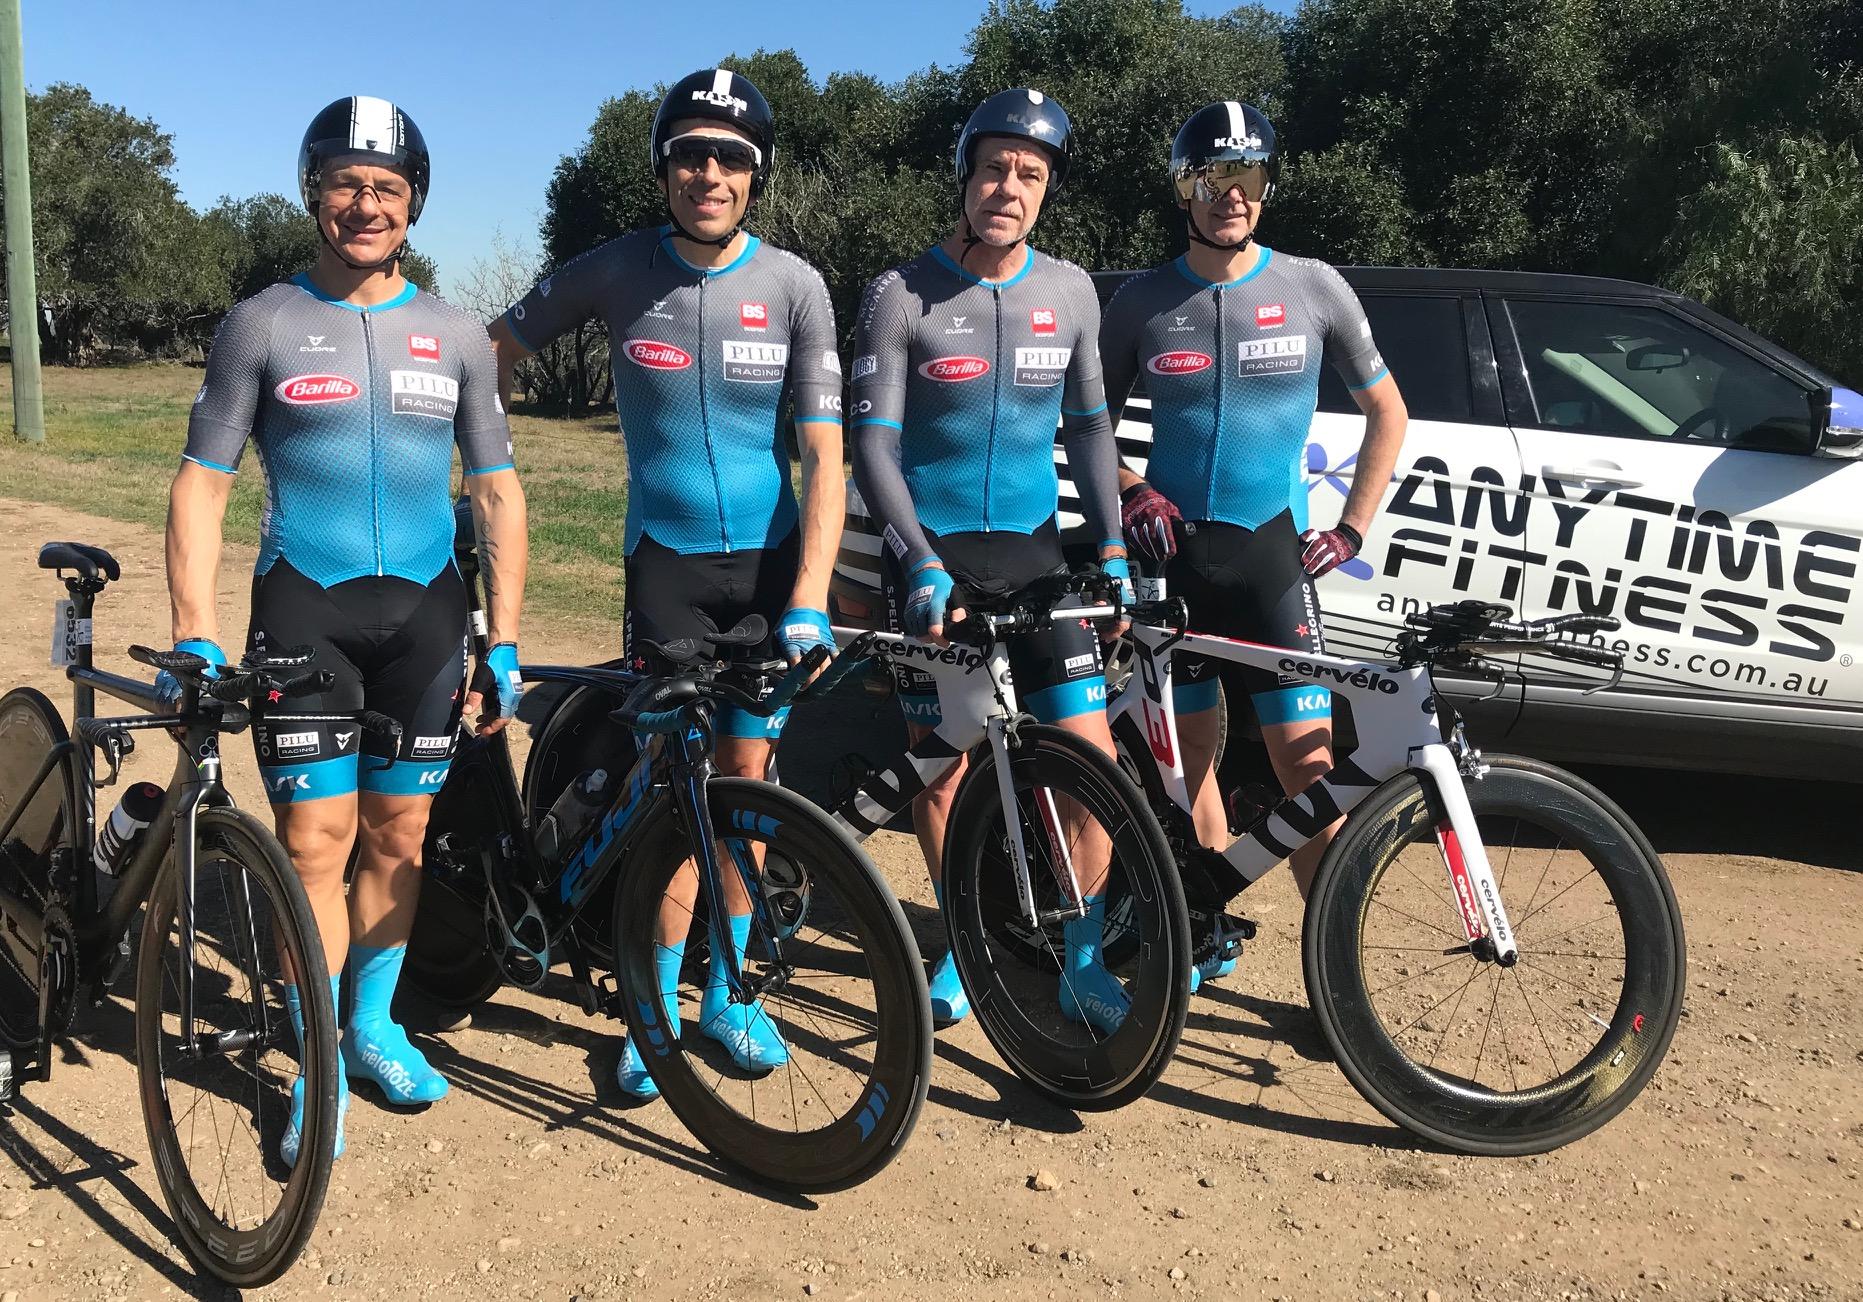 NSW Team Time Trial @ 3 August - Gio Pilu, Jordan Reizes, Matt Coy & Richard Bjorkmann